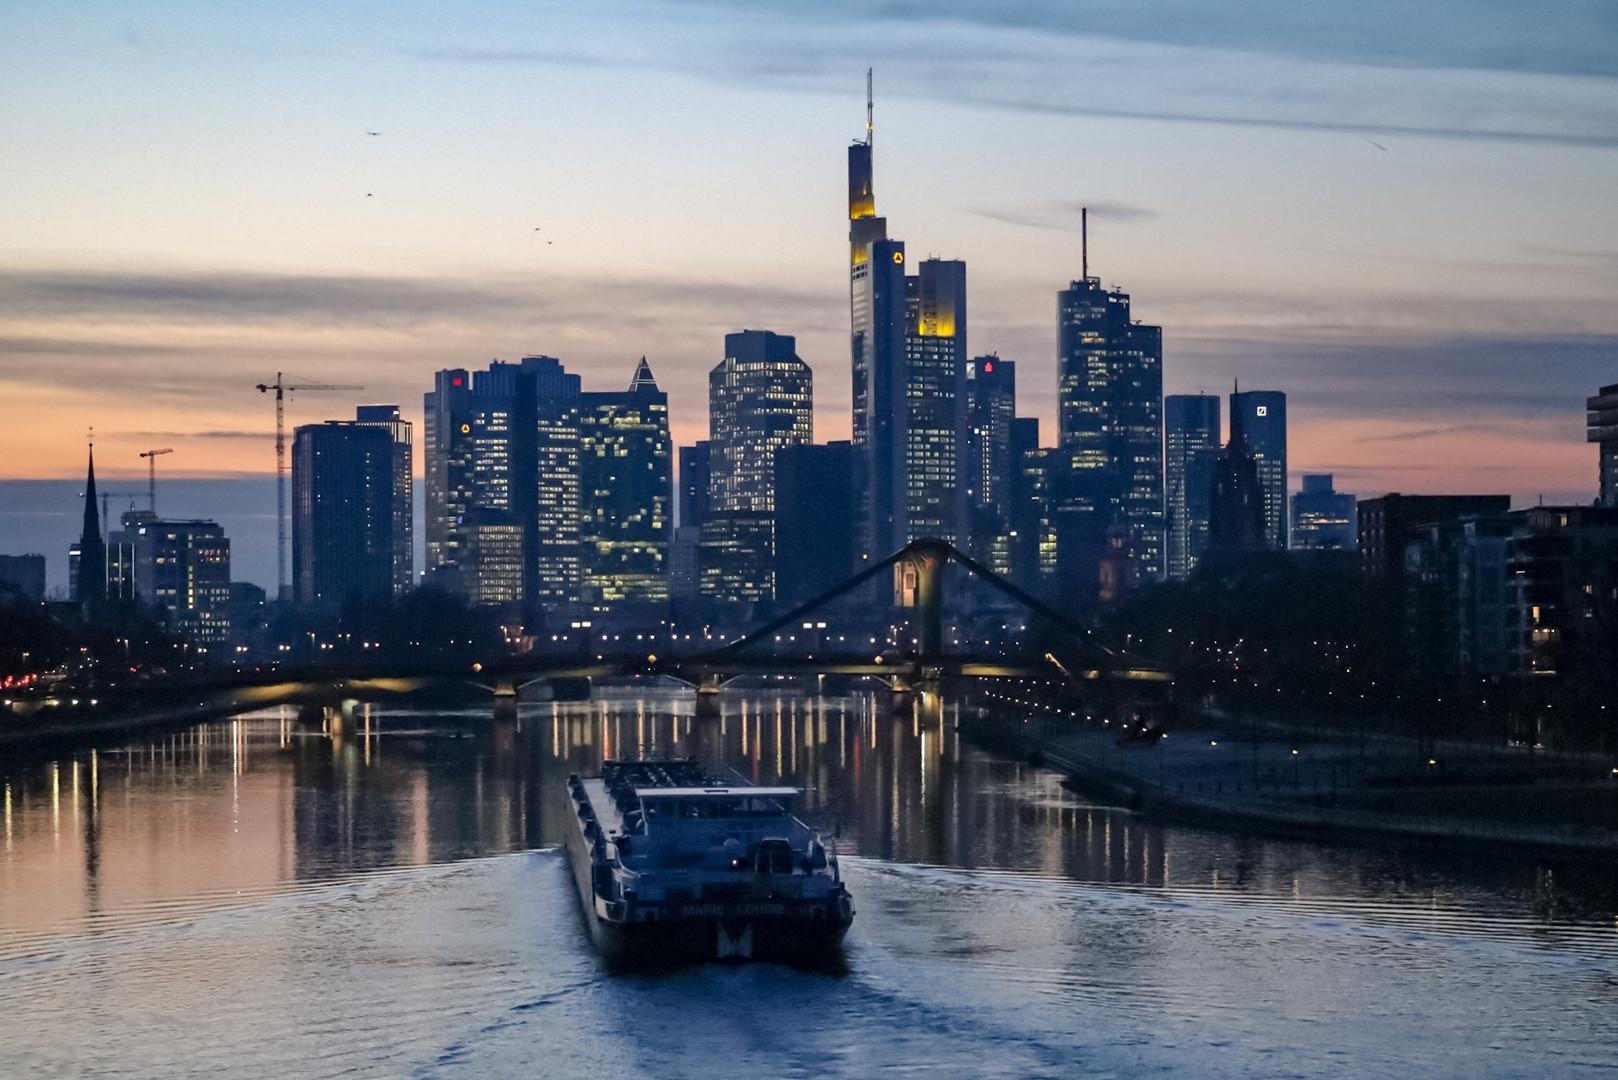 Frankfurt am Main Foto & Bild | architektur, architektur